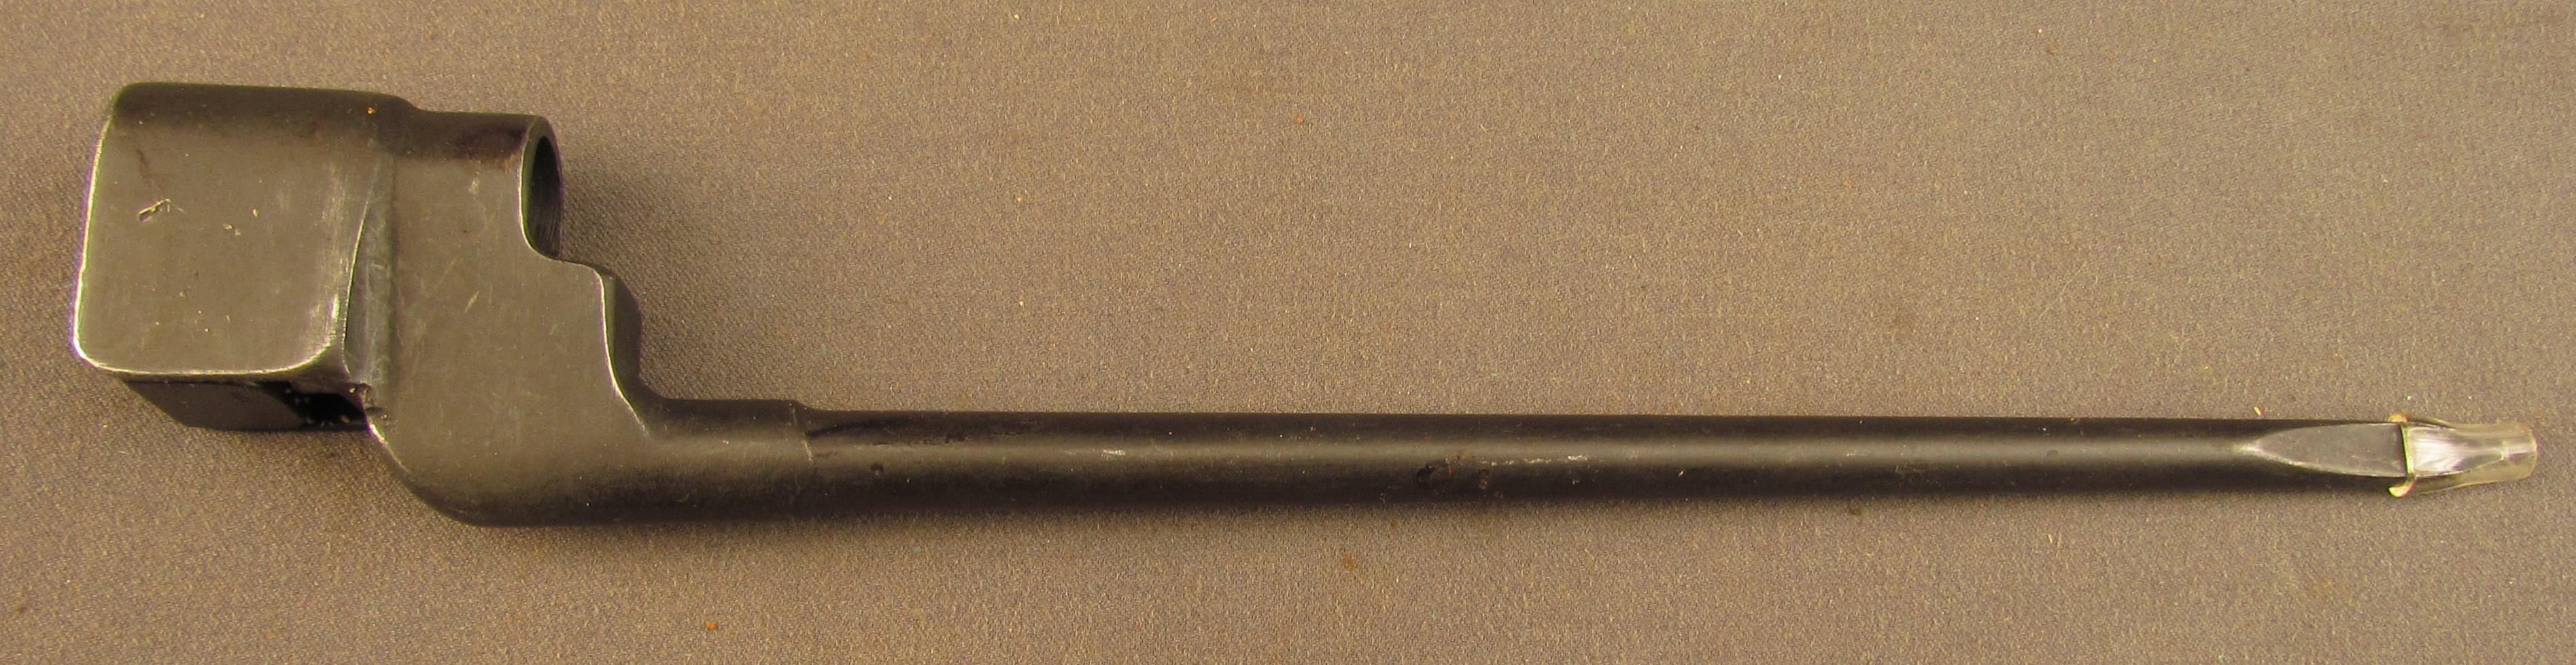 Enfield No 4 MK II Spike Bayonet and Scabbard .303 British Rifle